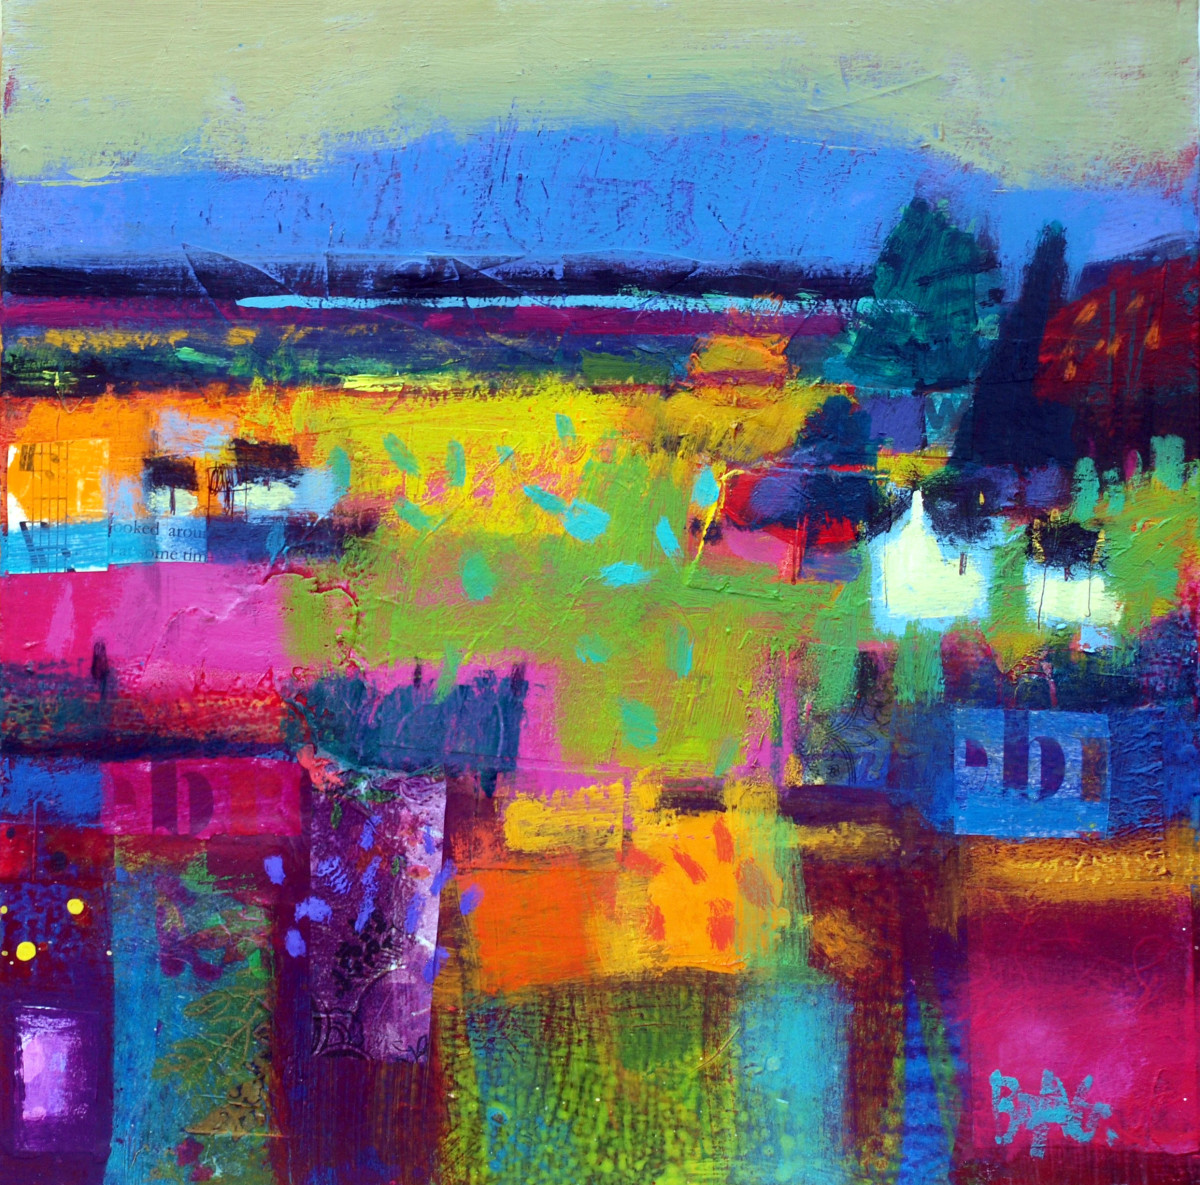 Angus hills Summer by francis boag